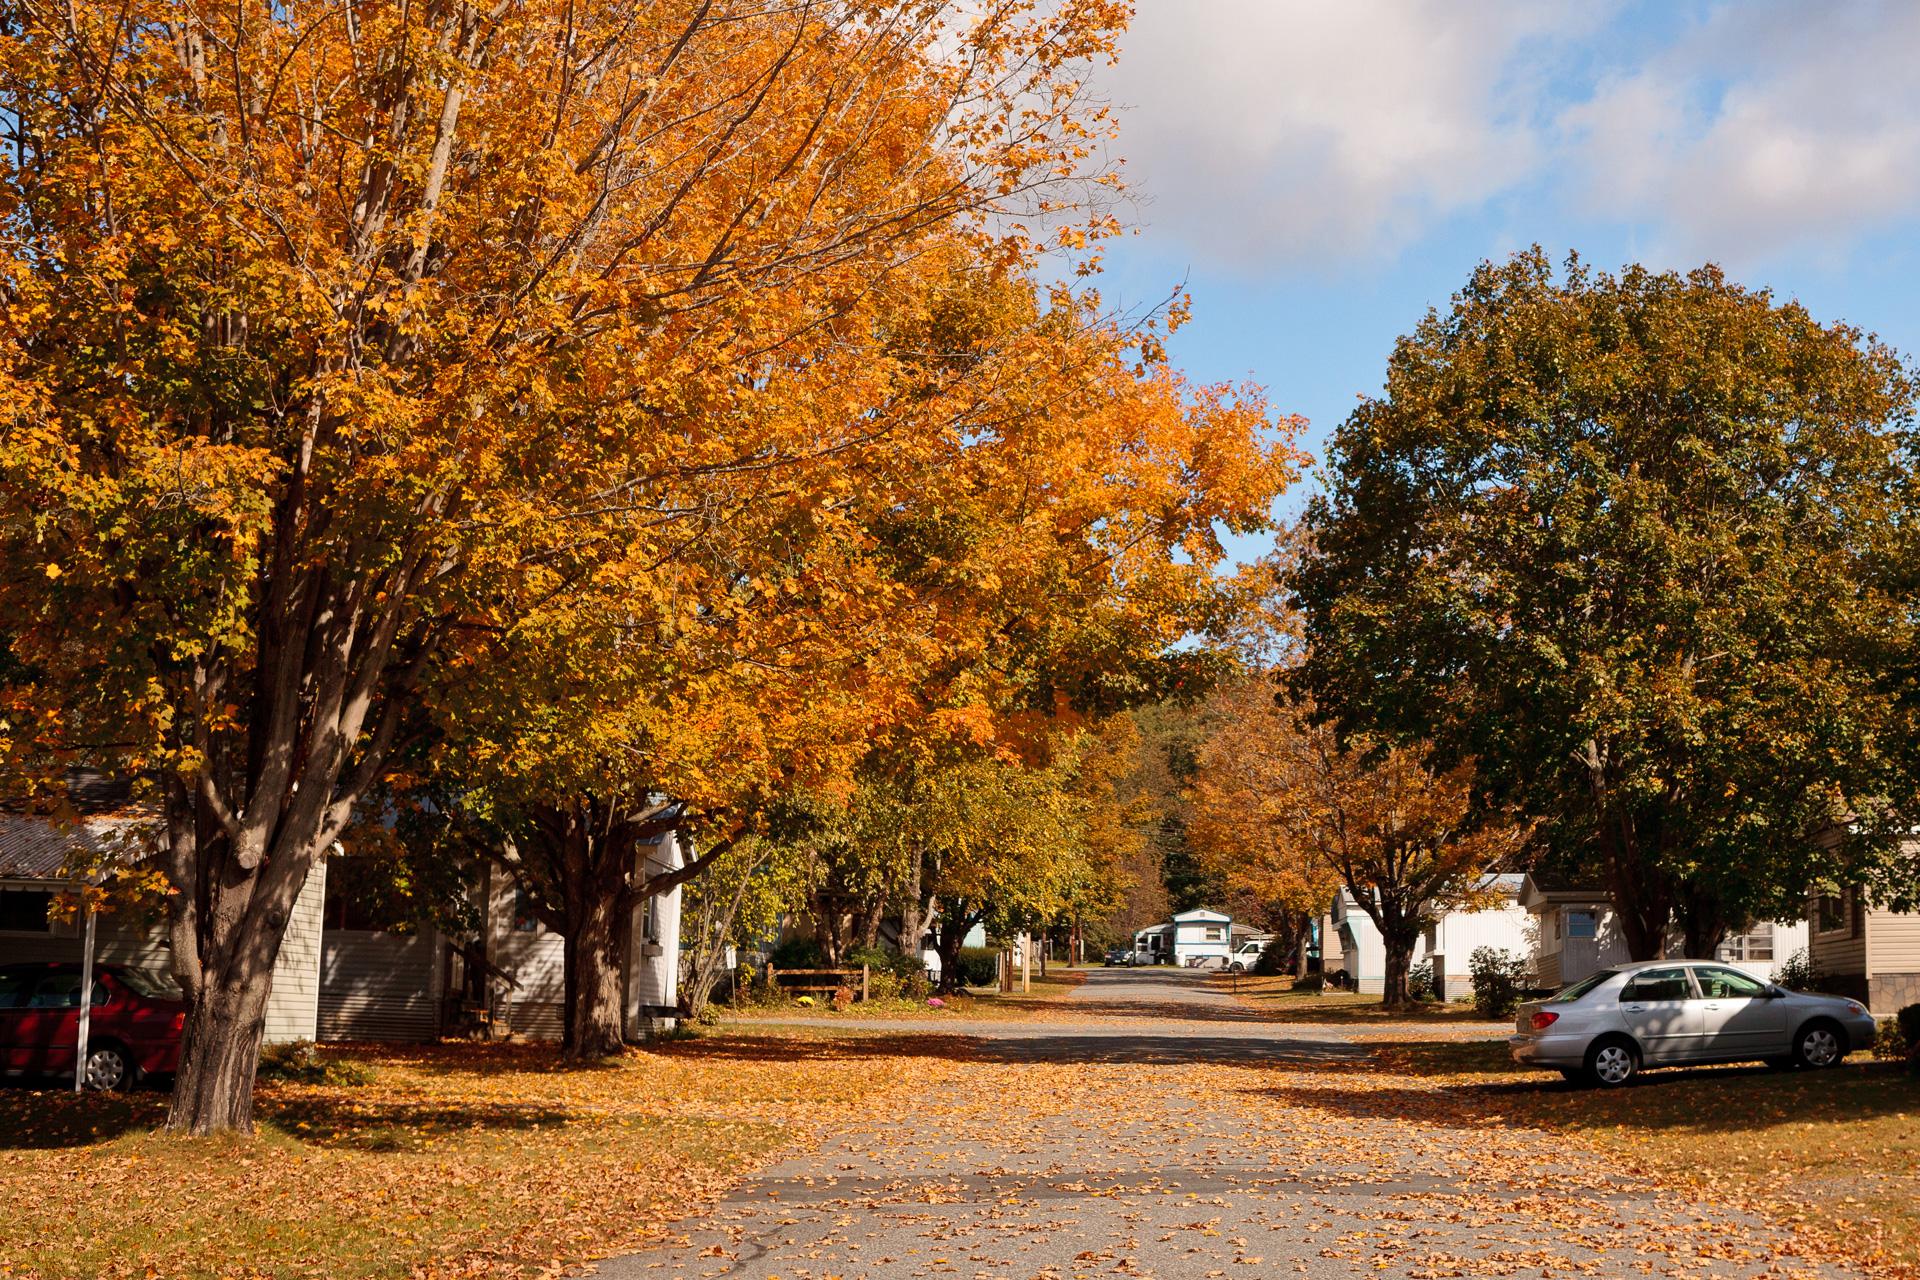 Autumn colors on a leafy street